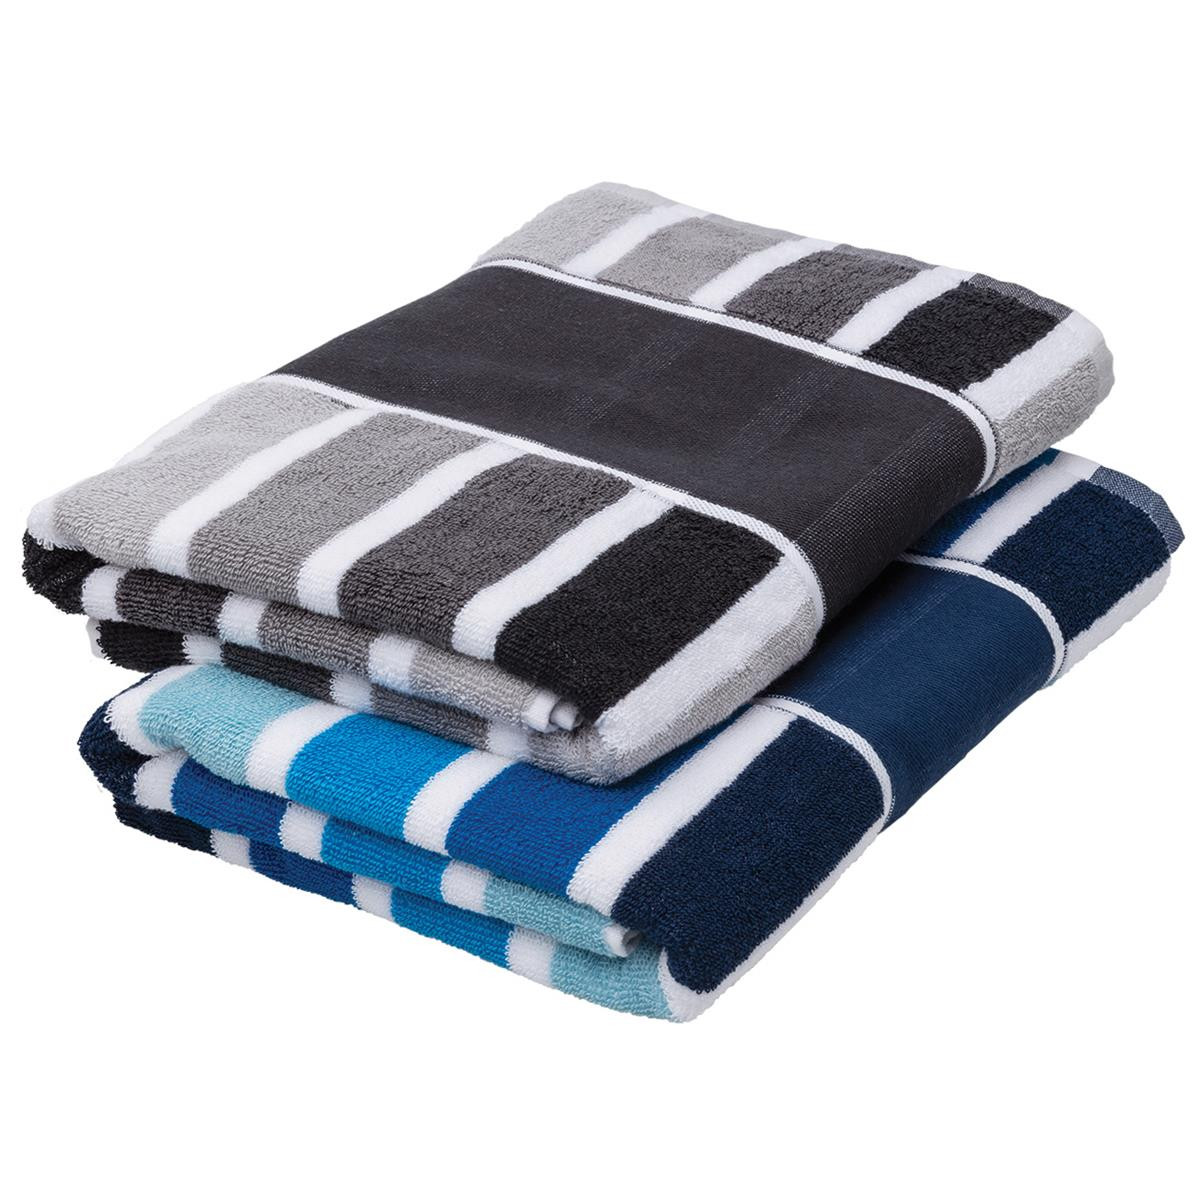 Promotional Product Cabana Towel